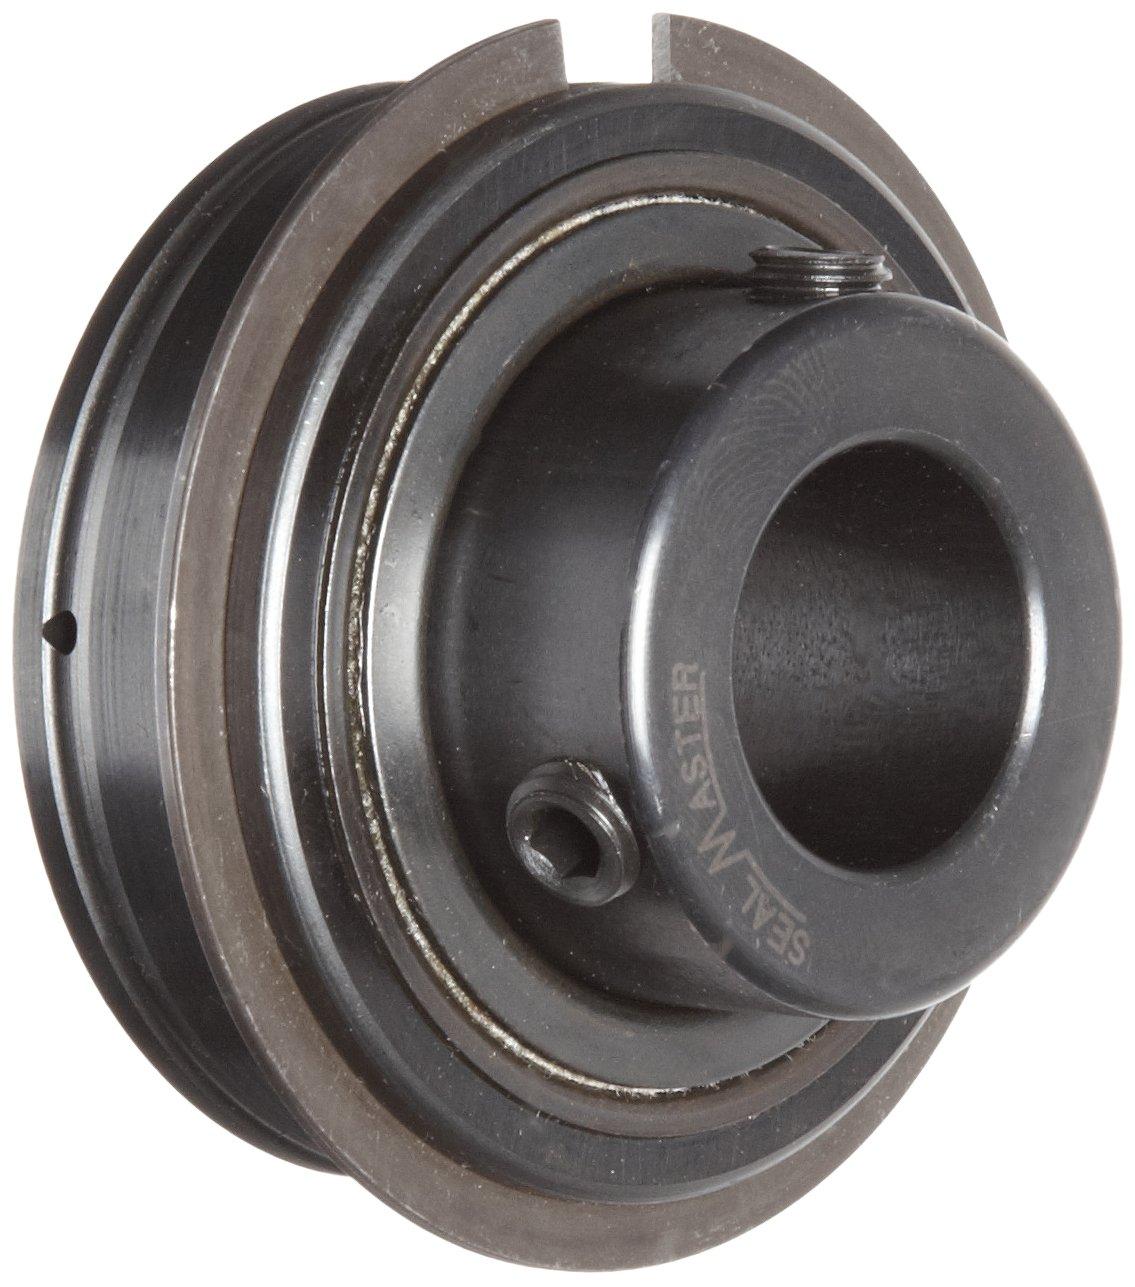 Sealmaster ER-11 Cylindrical OD Bearing, Setscrew Locking Collar, Light Contact Felt Seals, 11/16